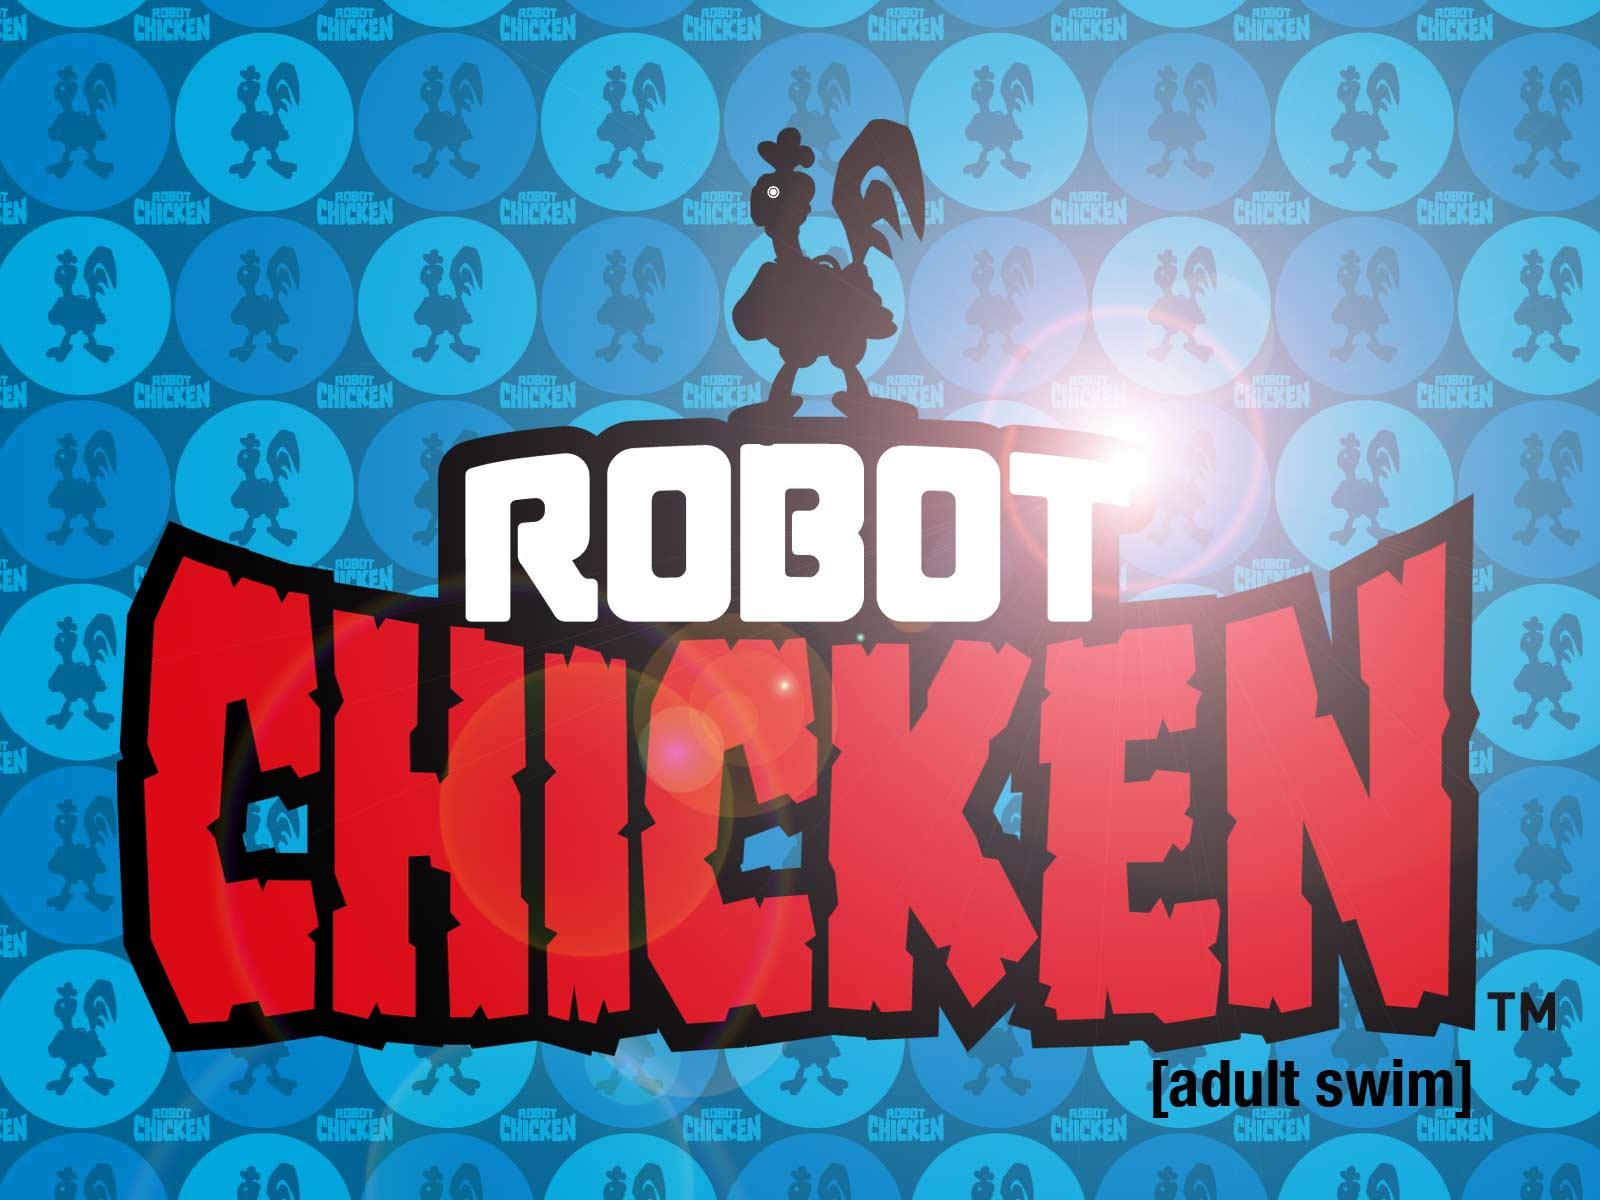 robotchicken-936422.jpeg